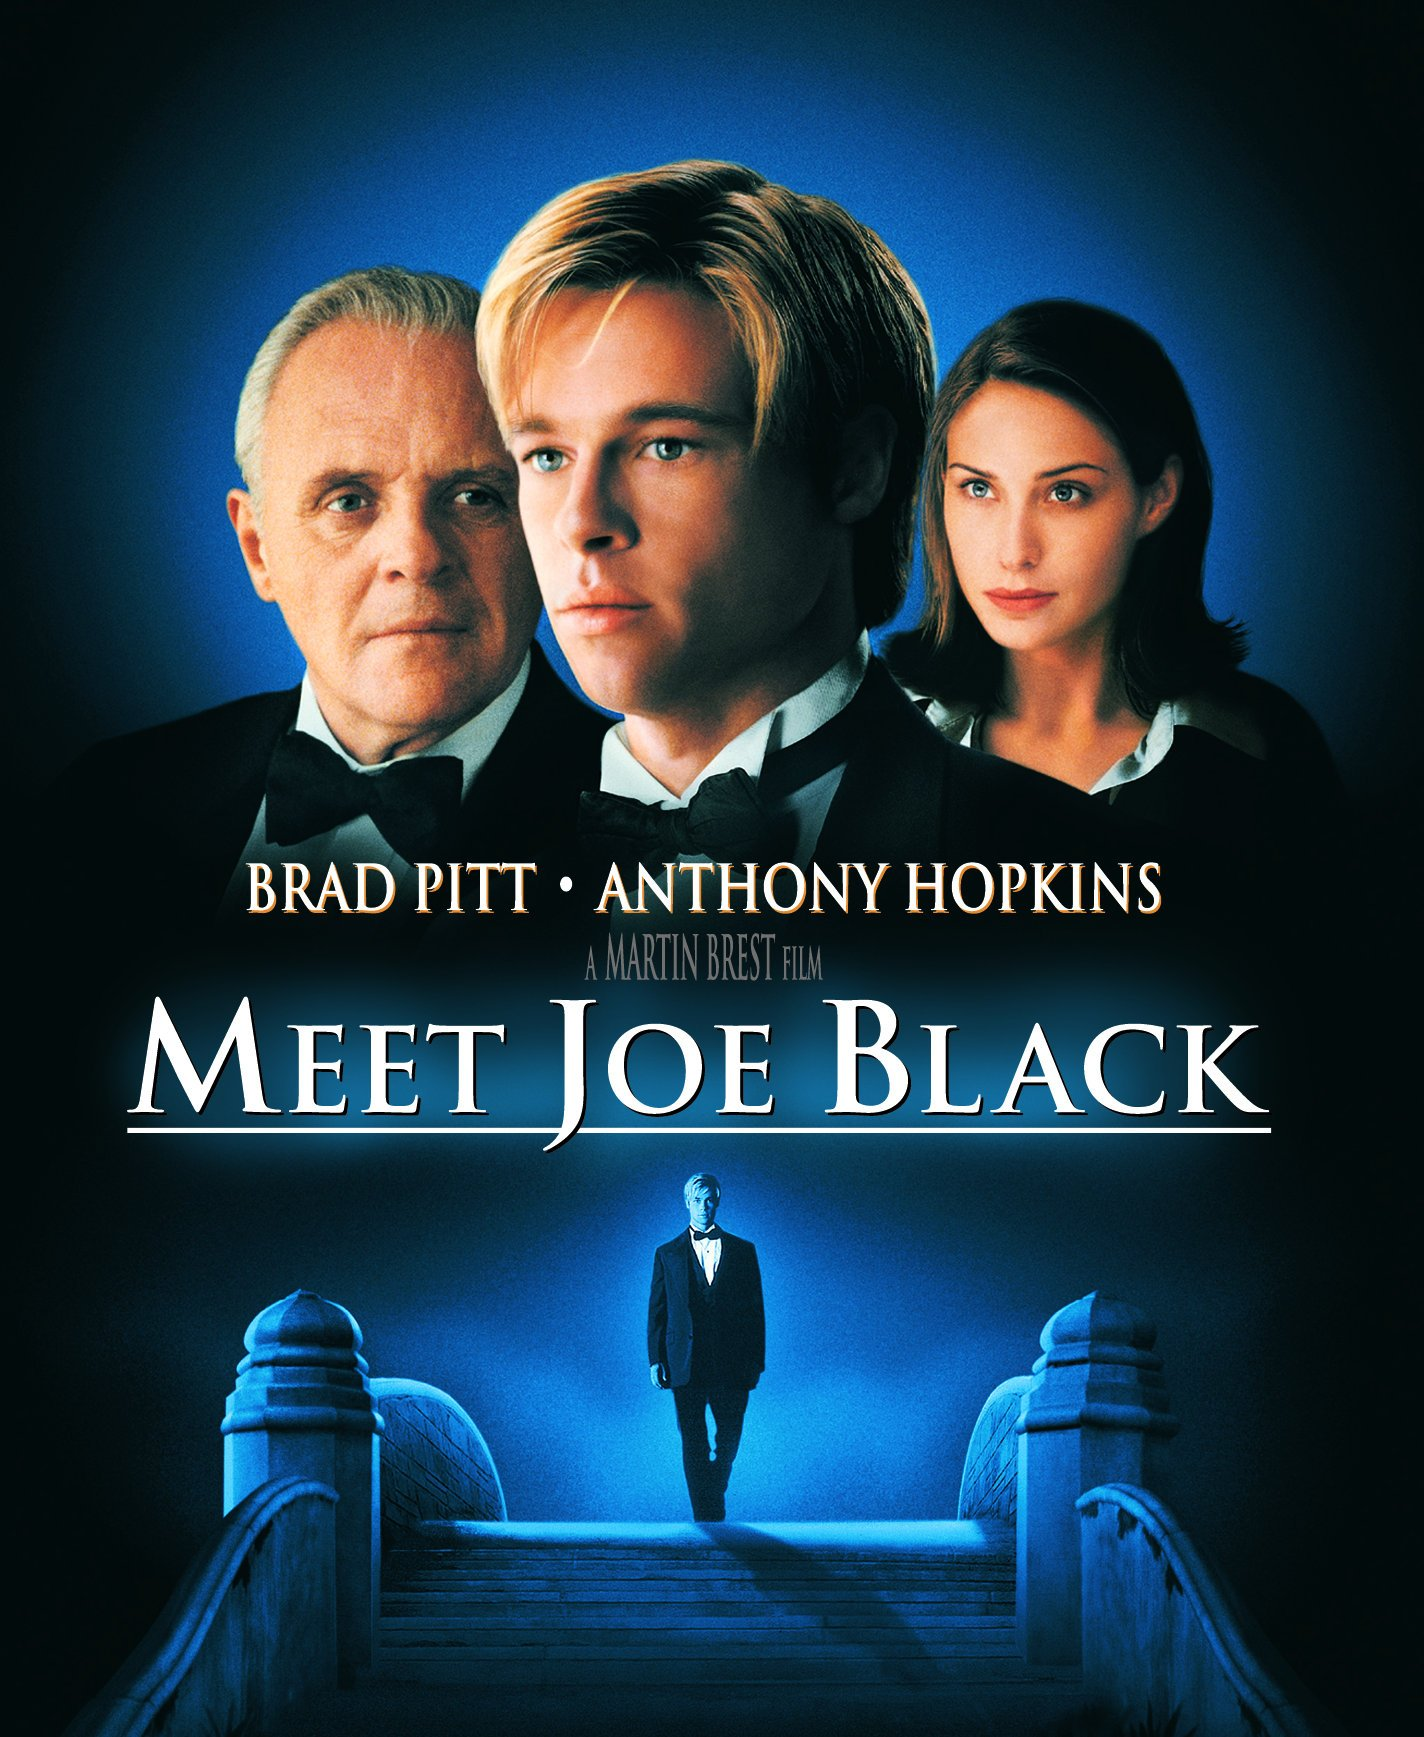 Regarder Film Rencontre Avec Joe Black Gratuitement   aacs-asso.fr